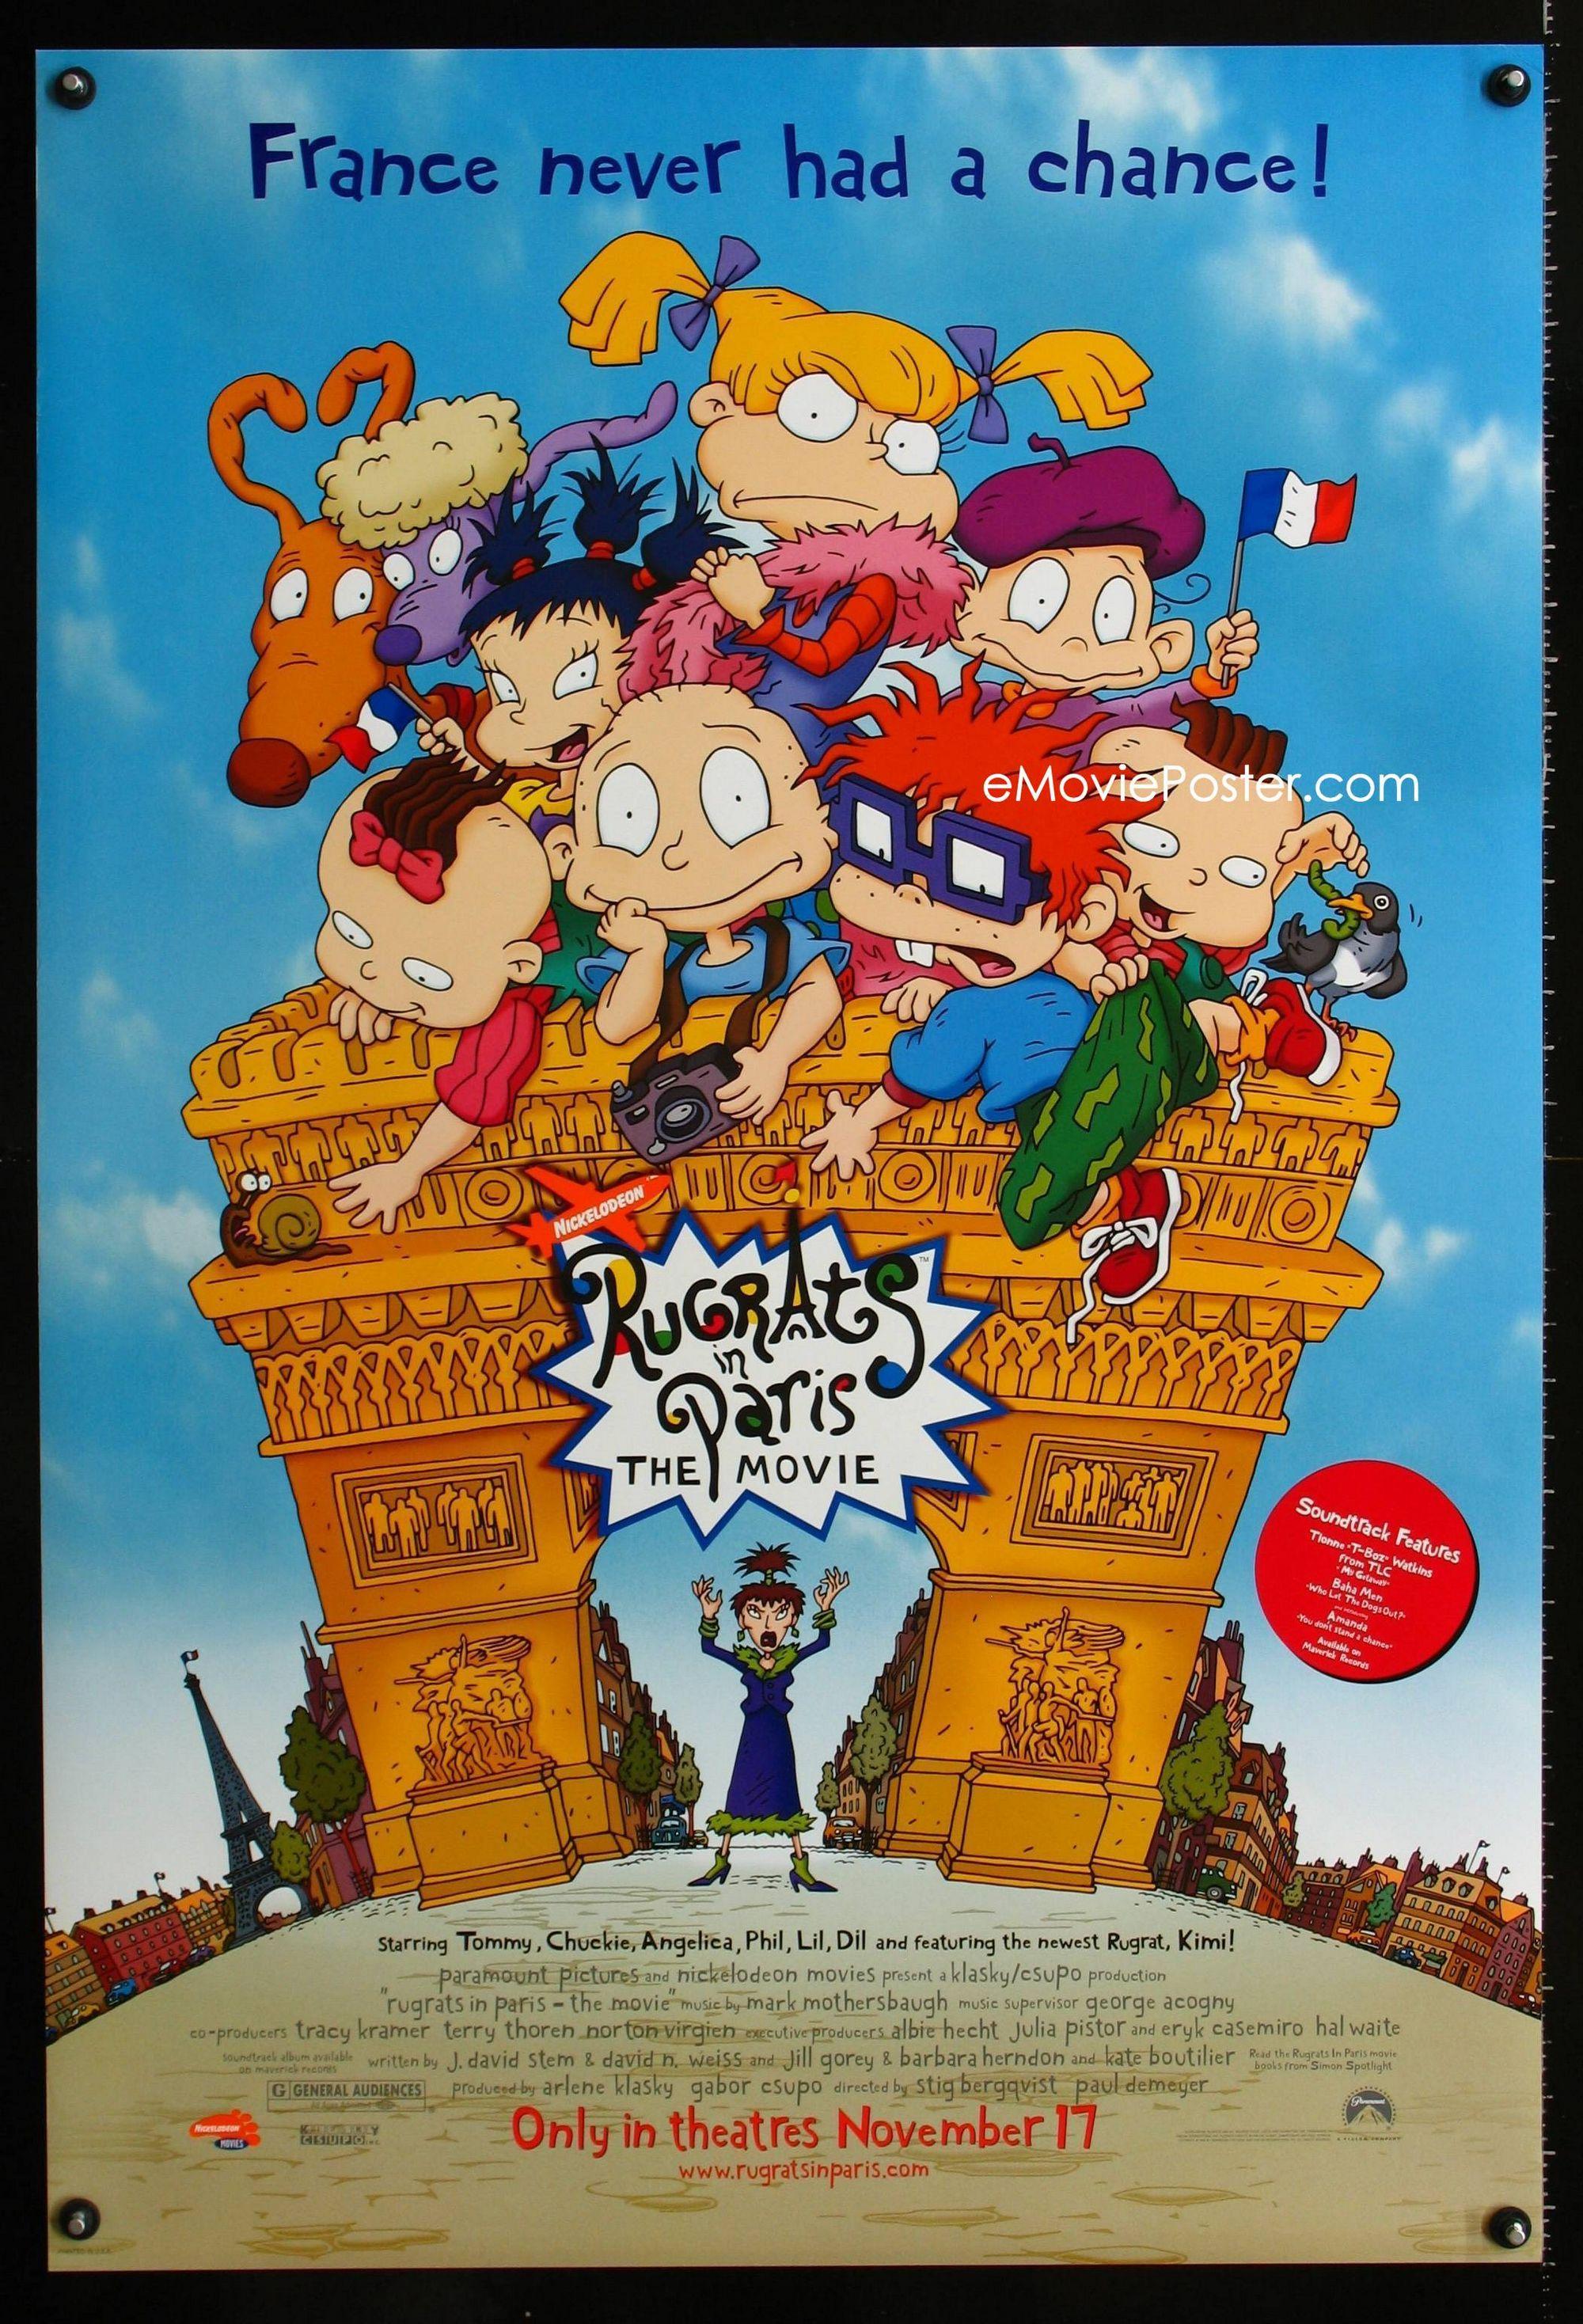 Nickelodeon Paris : nickelodeon, paris, EMoviePoster.com, Image, 0756UF, RUGRATS, PARIS, Advance, Great, Cartoon, Nickelodeon, France!